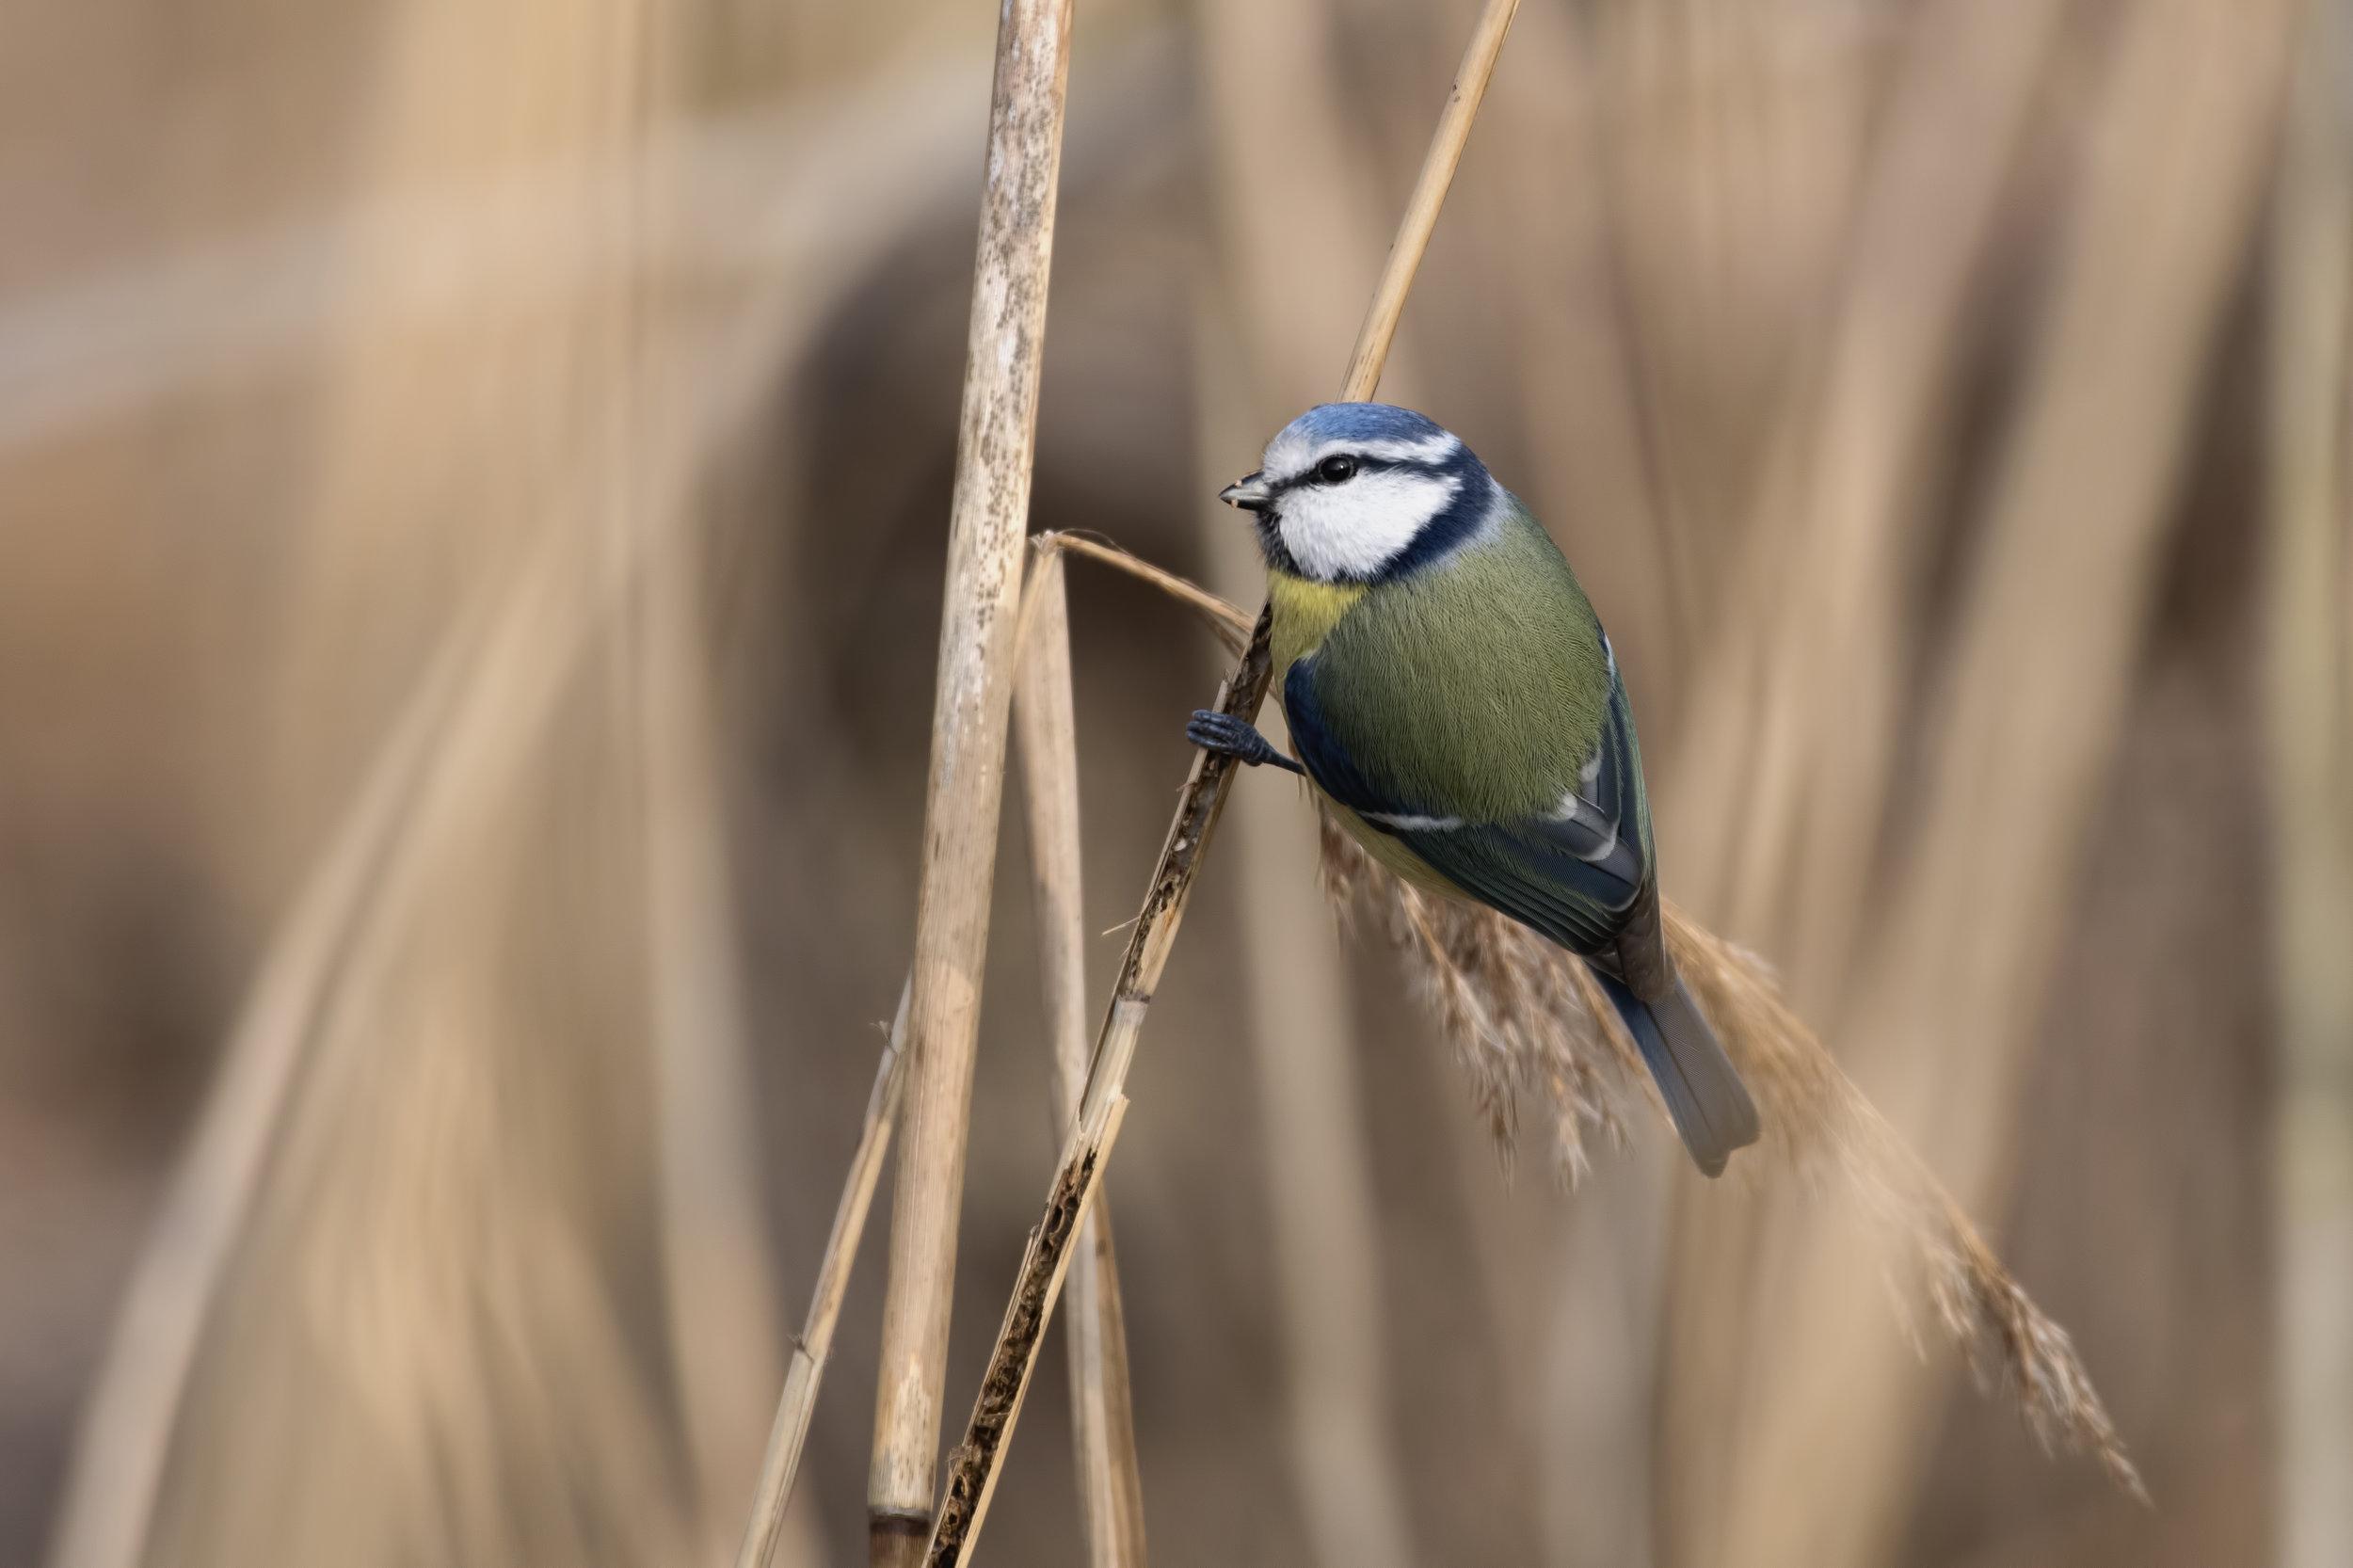 A bluetit perching on a twig